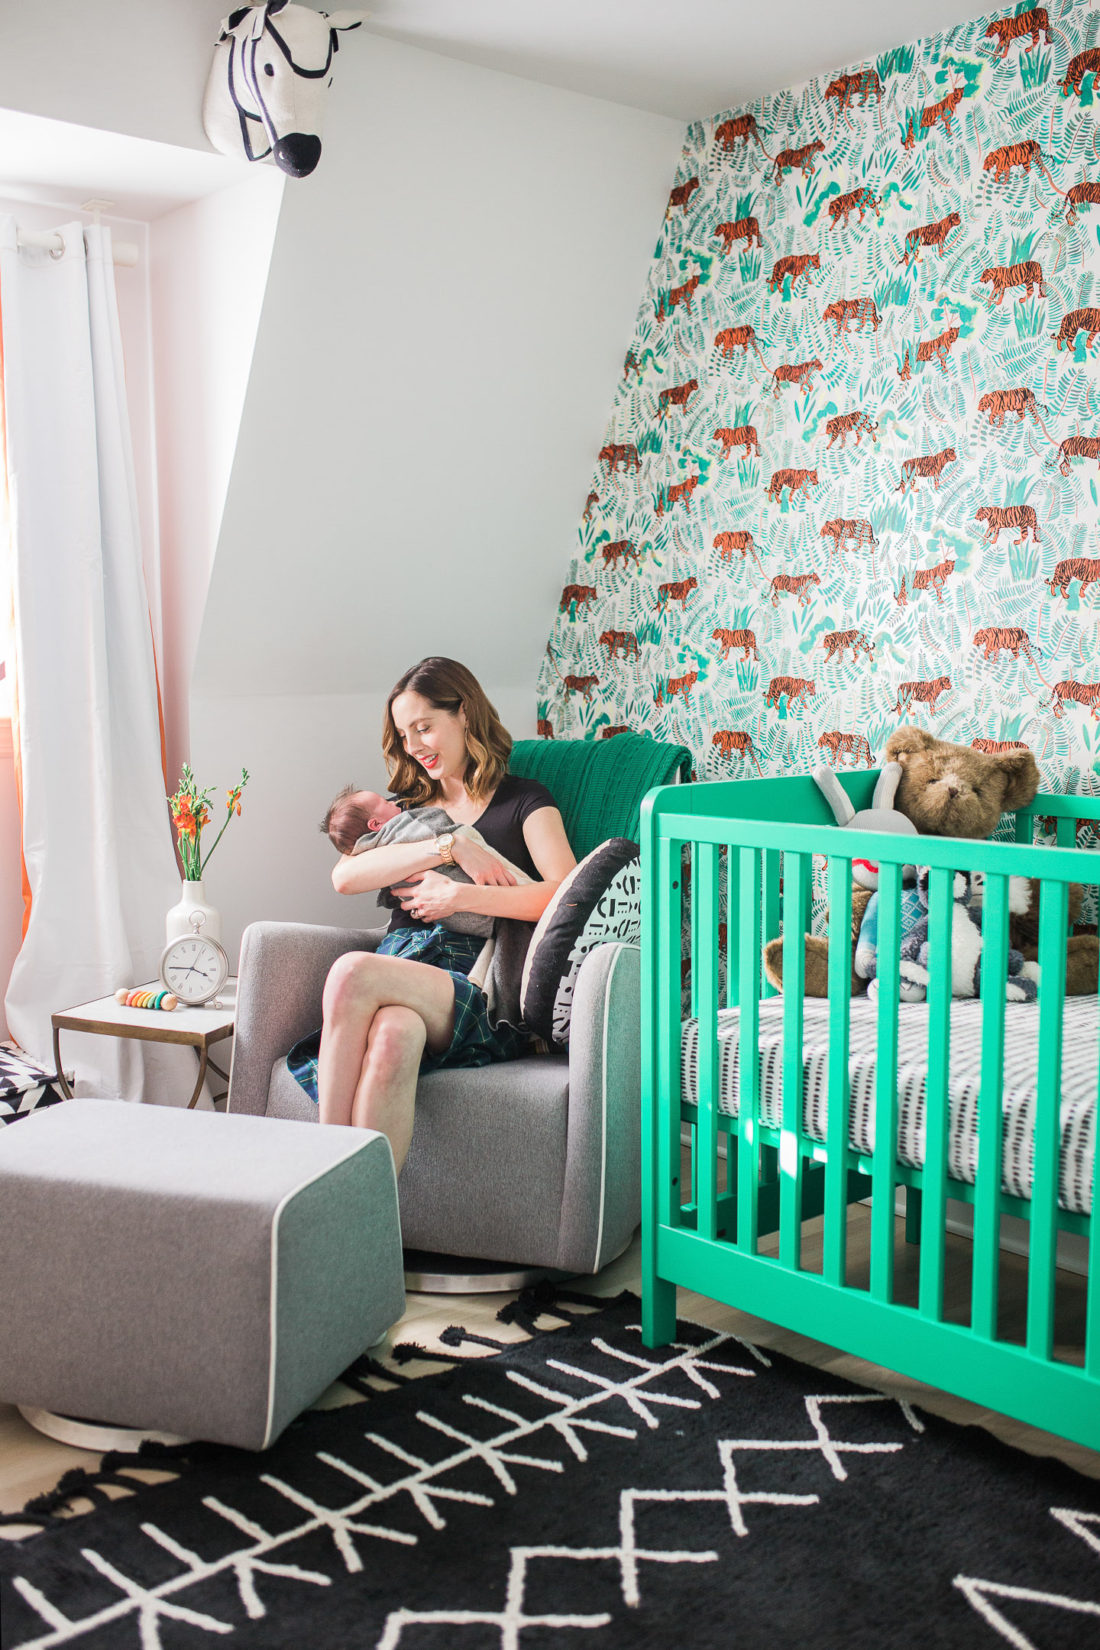 Eva Amurri Martino hold her newborn son Major in his graphic and bold nursery